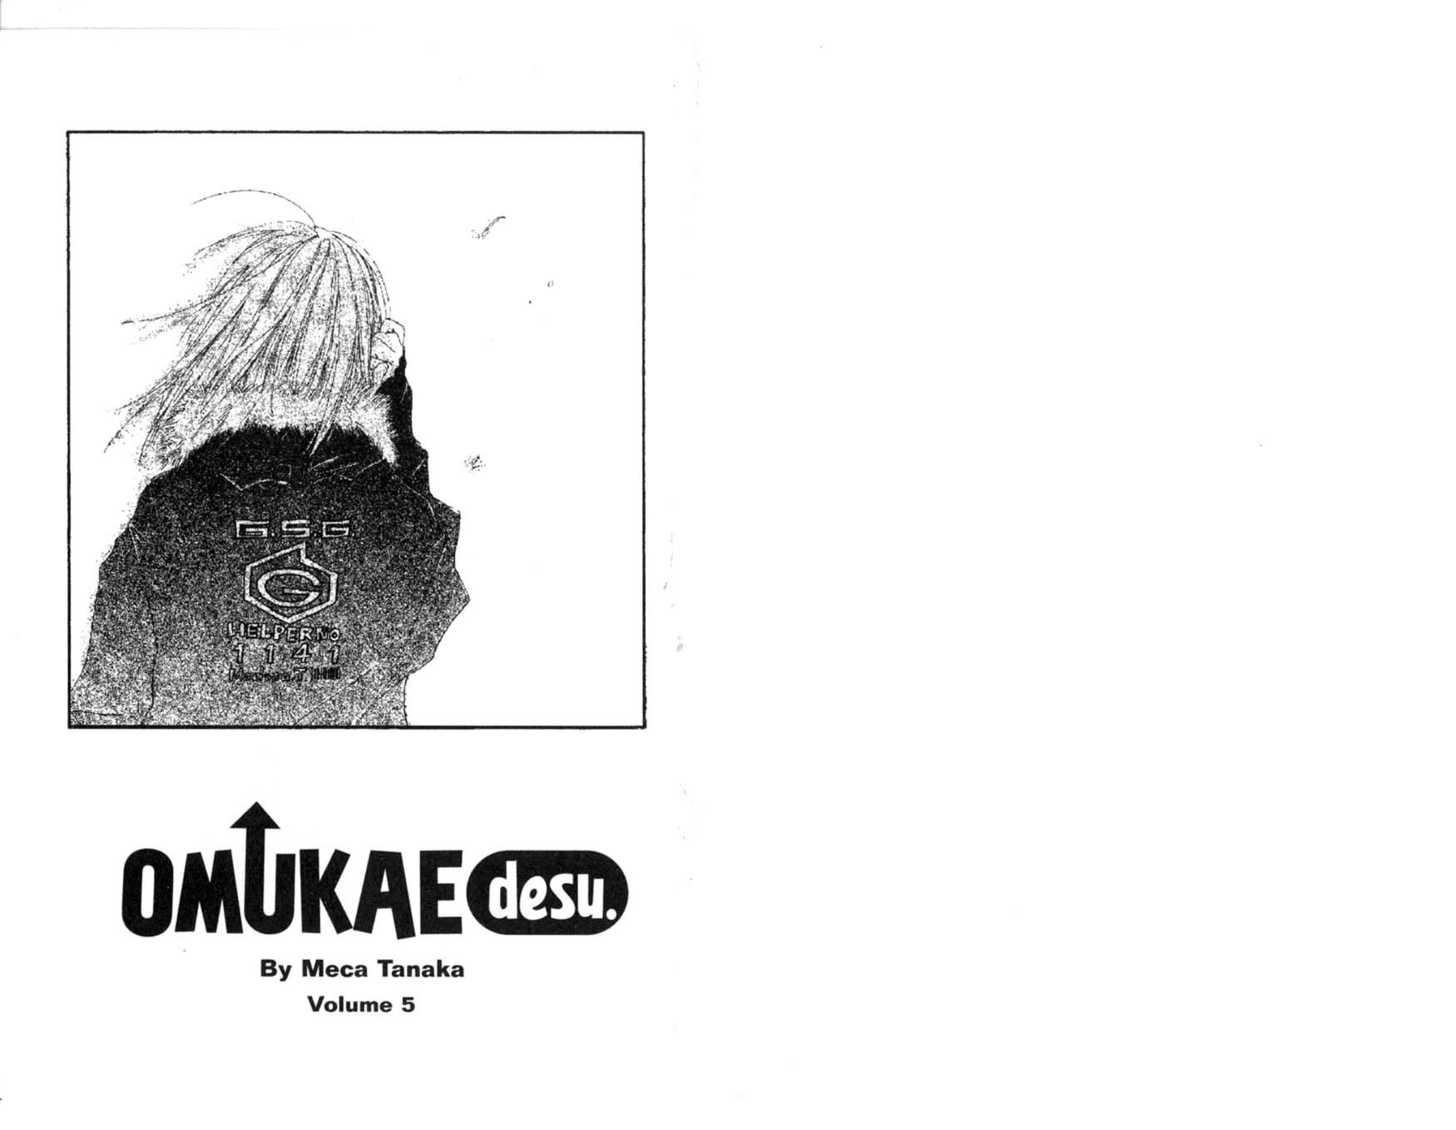 Omukae Desu 0 Page 2